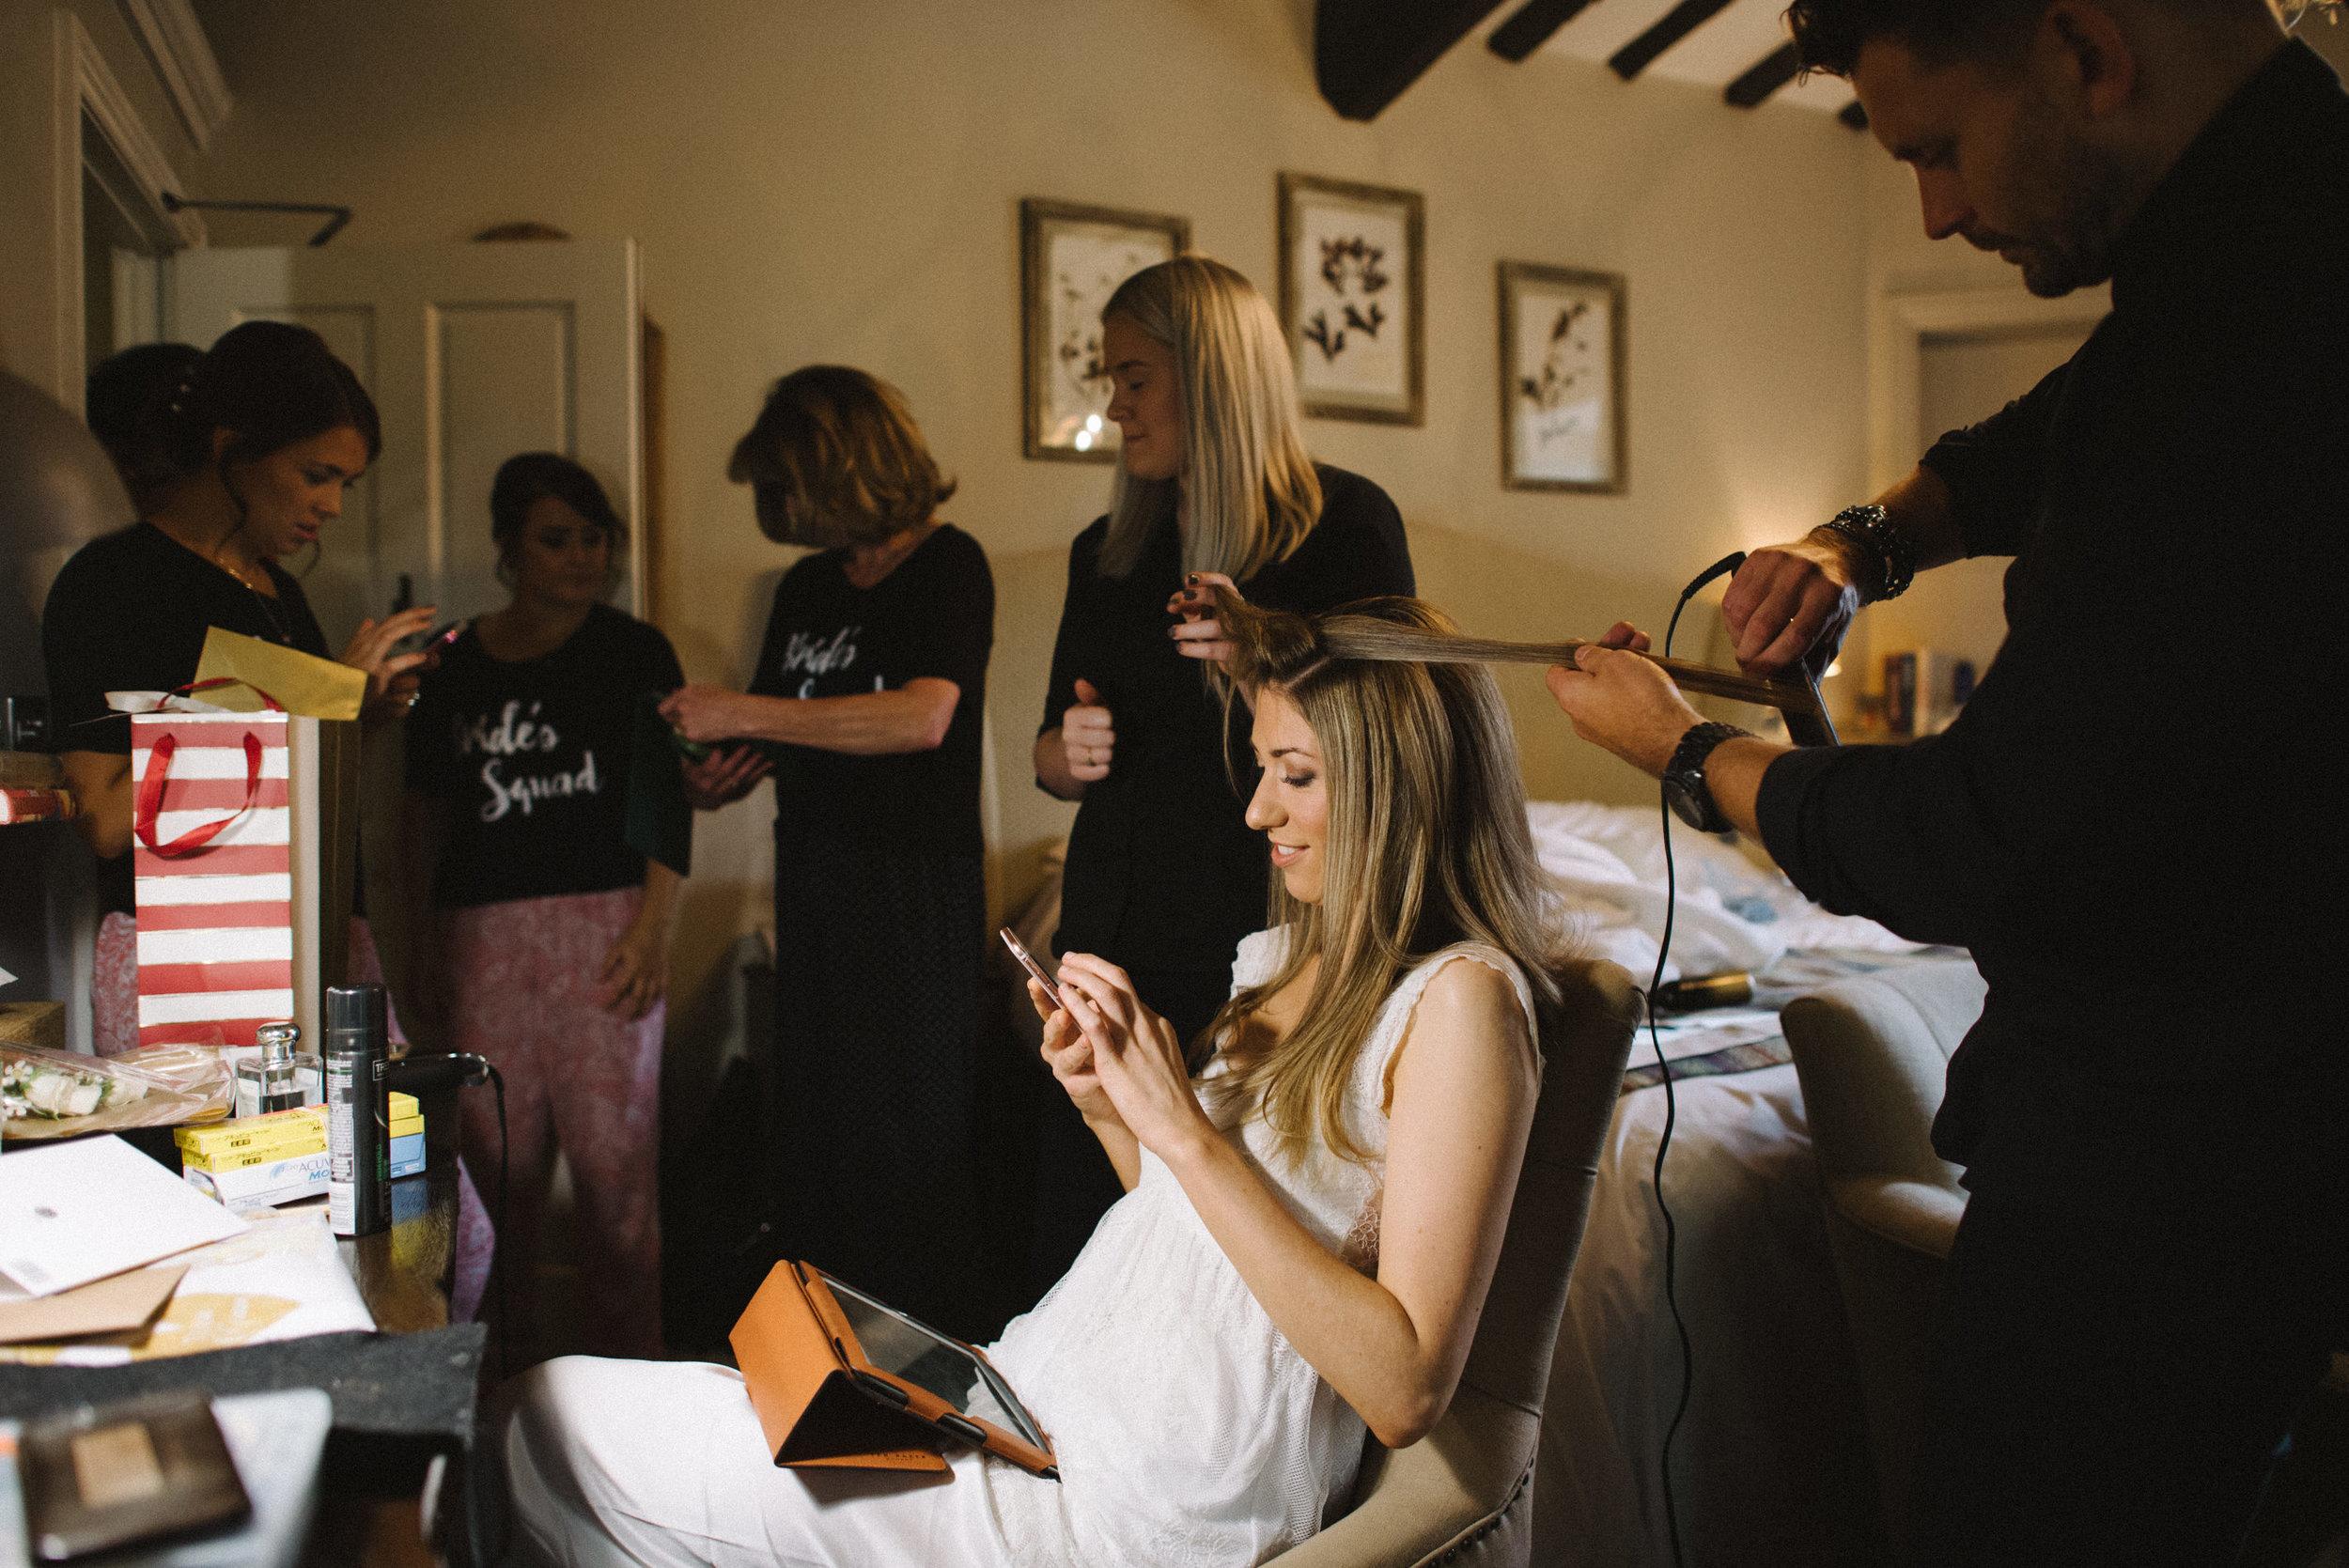 0110-LISA-DEVINE-PHOTOGRAPHY-ALTERNATIVE-WEDDING-PHOTOGRAPHY-SCOTLAND-DESTINATION-WEDDINGS-GLASGOW-WEDDINGS-COOL-WEDDINGS-STYLISH-WEDDINGS.JPG